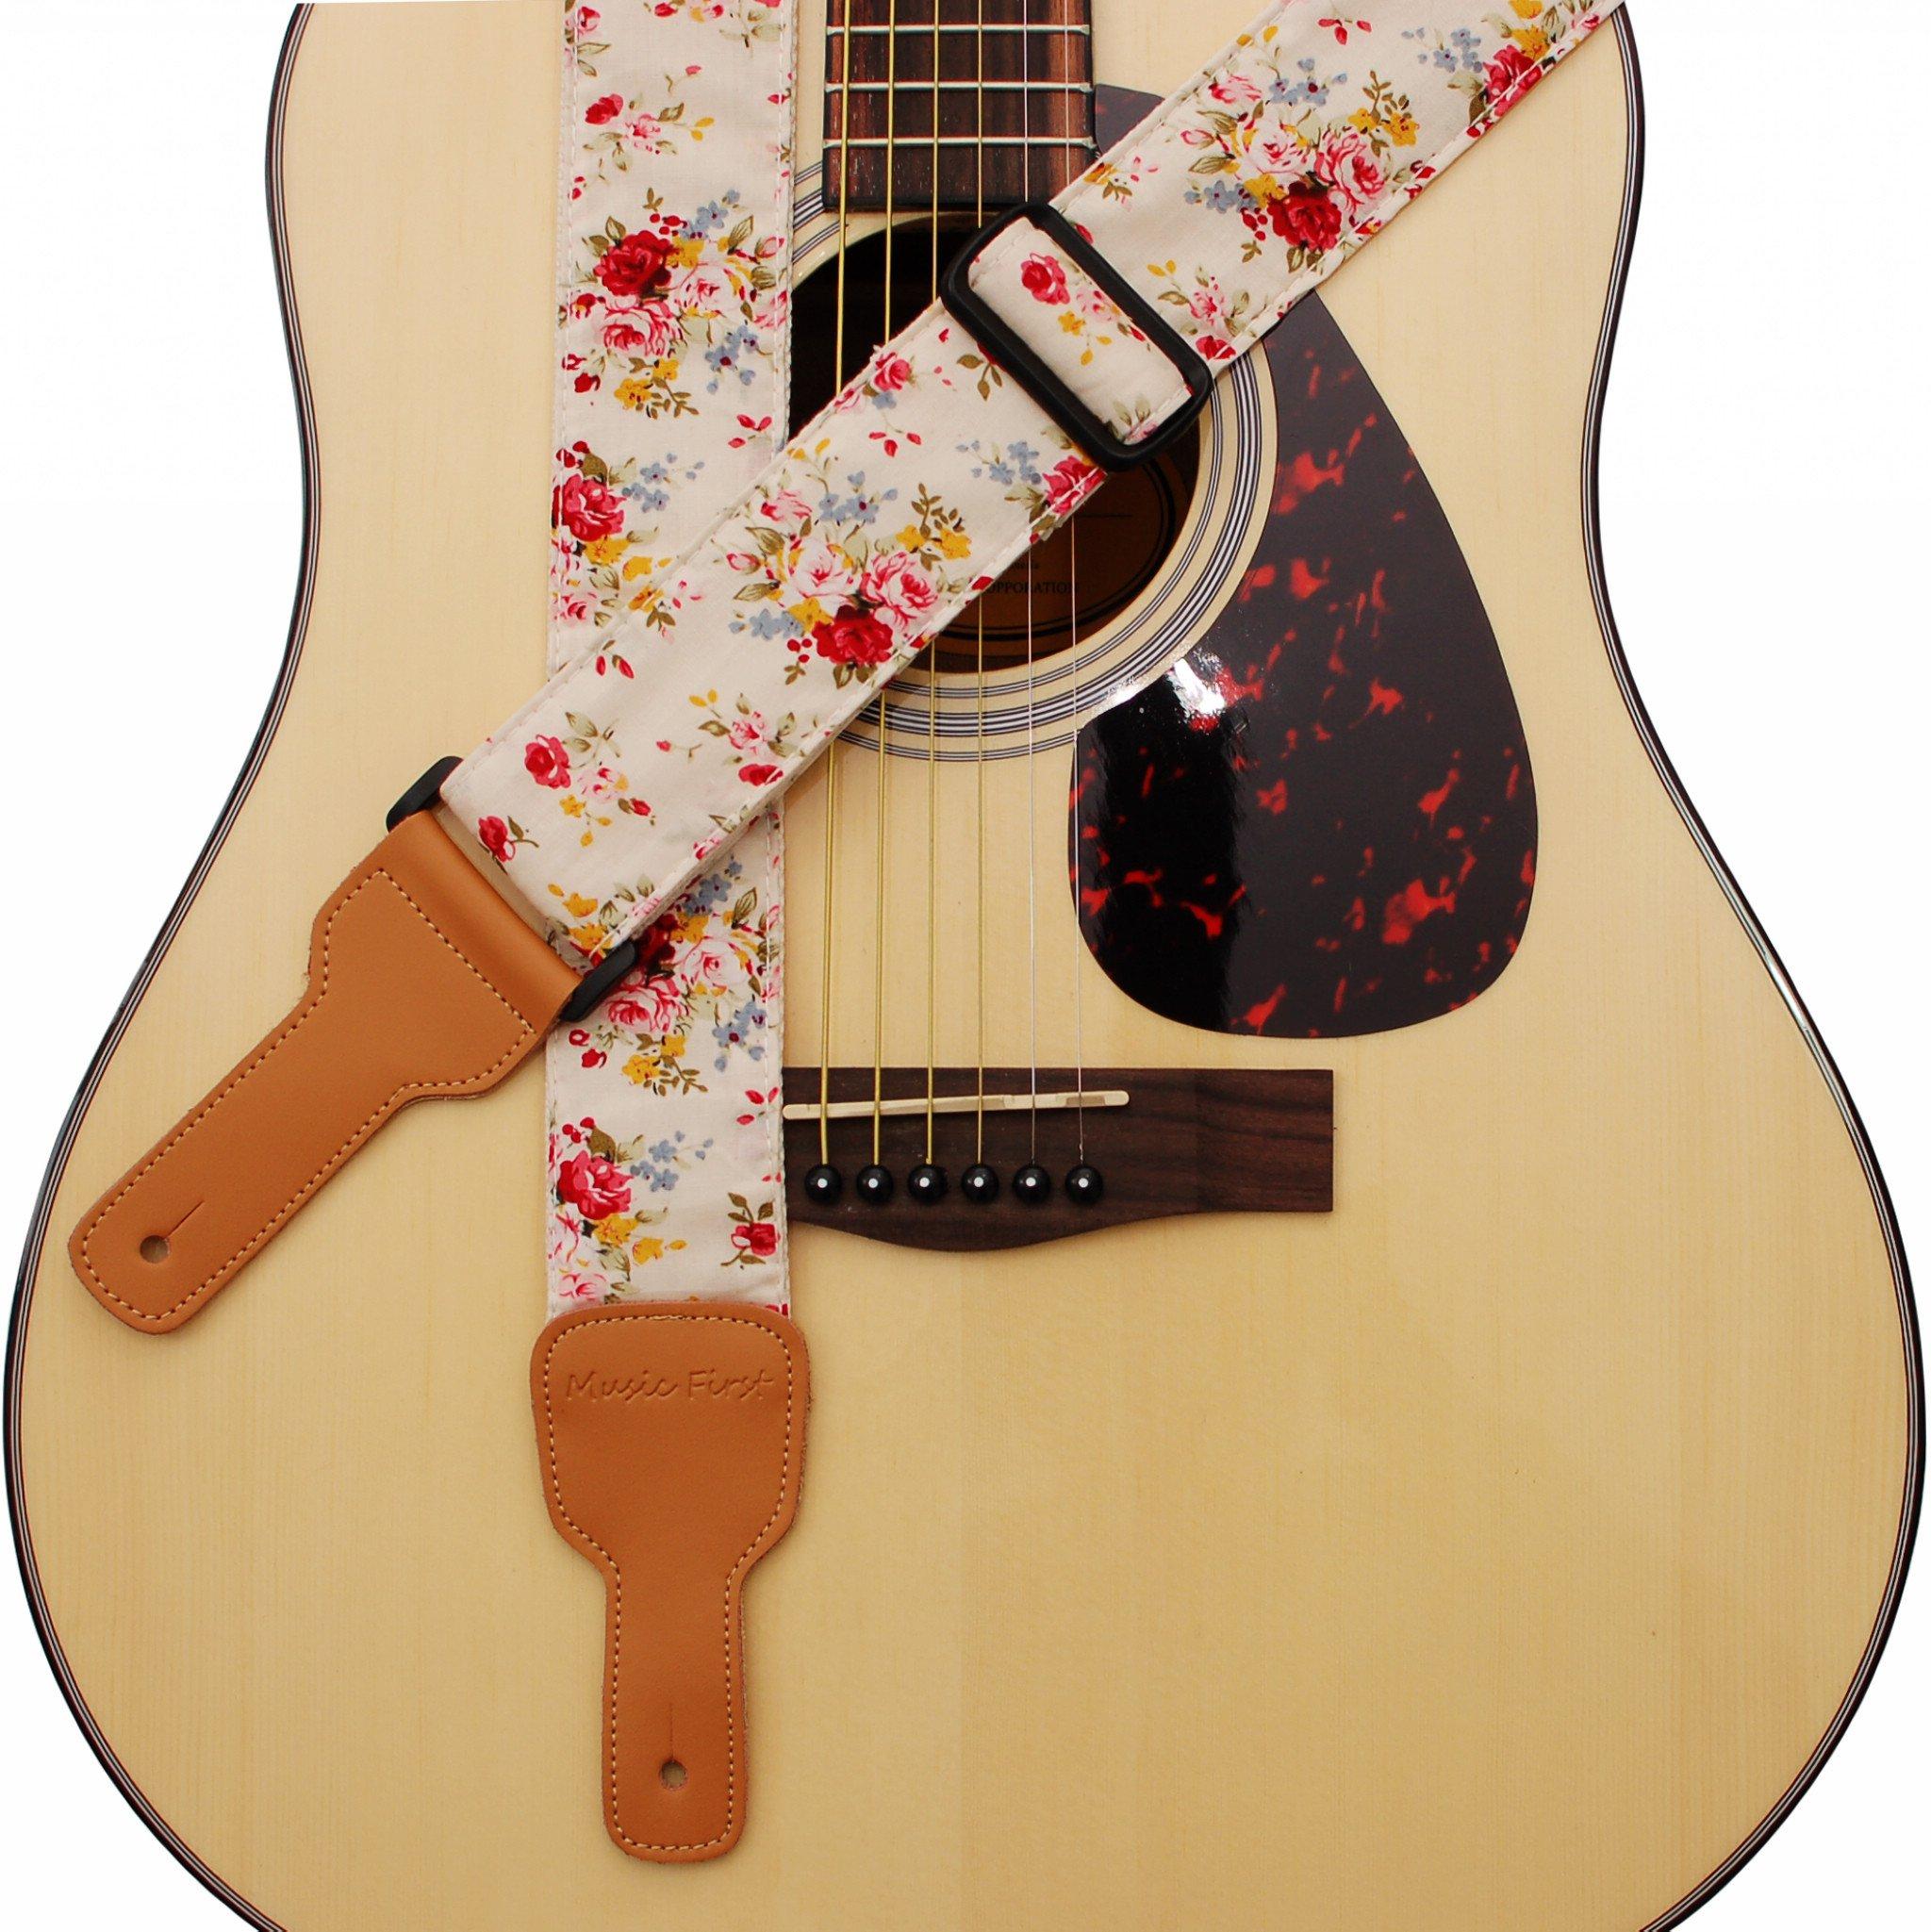 "MUSIC FIRST Original Design ""Rosa Multiflora in Cream"" Padded Soft Cotton & Genuine Leather Guitar Strap, Banjo Strap"